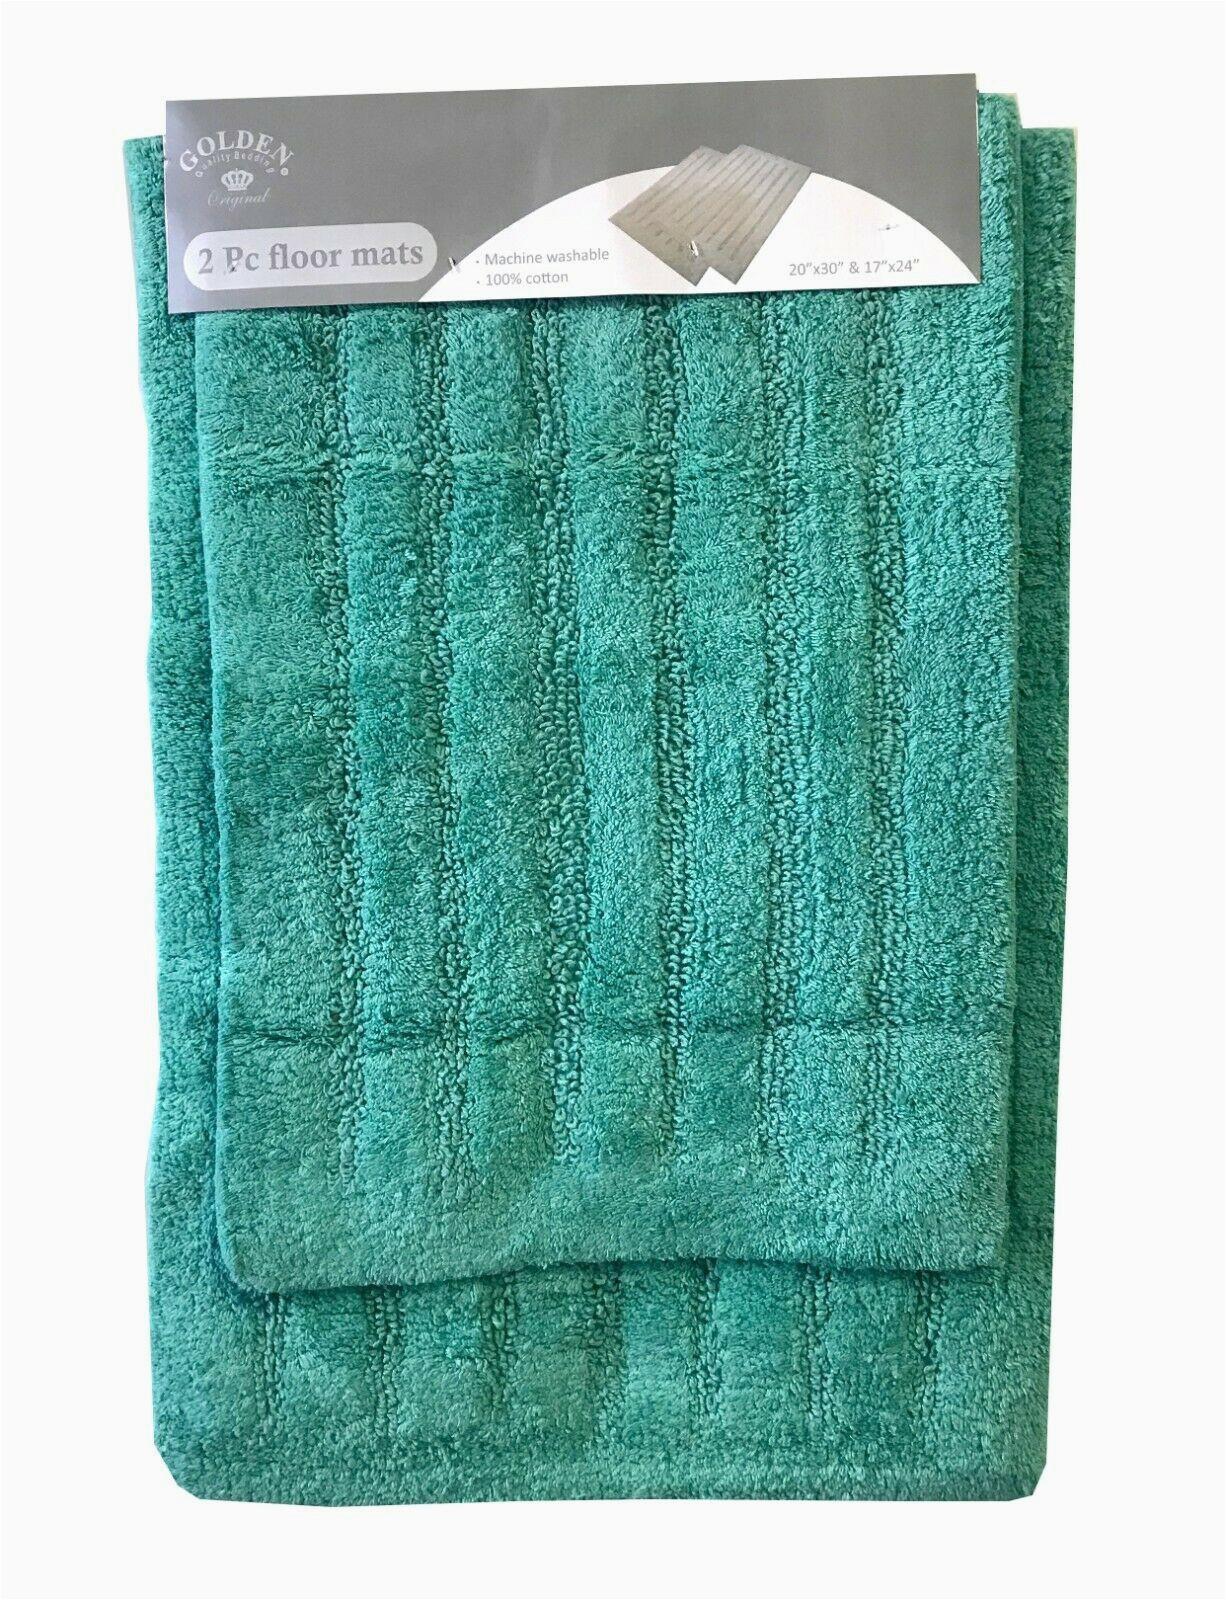 Cotton Bathroom Rug Sets 2 Piece Cotton Bath Rug Set Bathroom Mat Ultra Absorbent Machine Washable